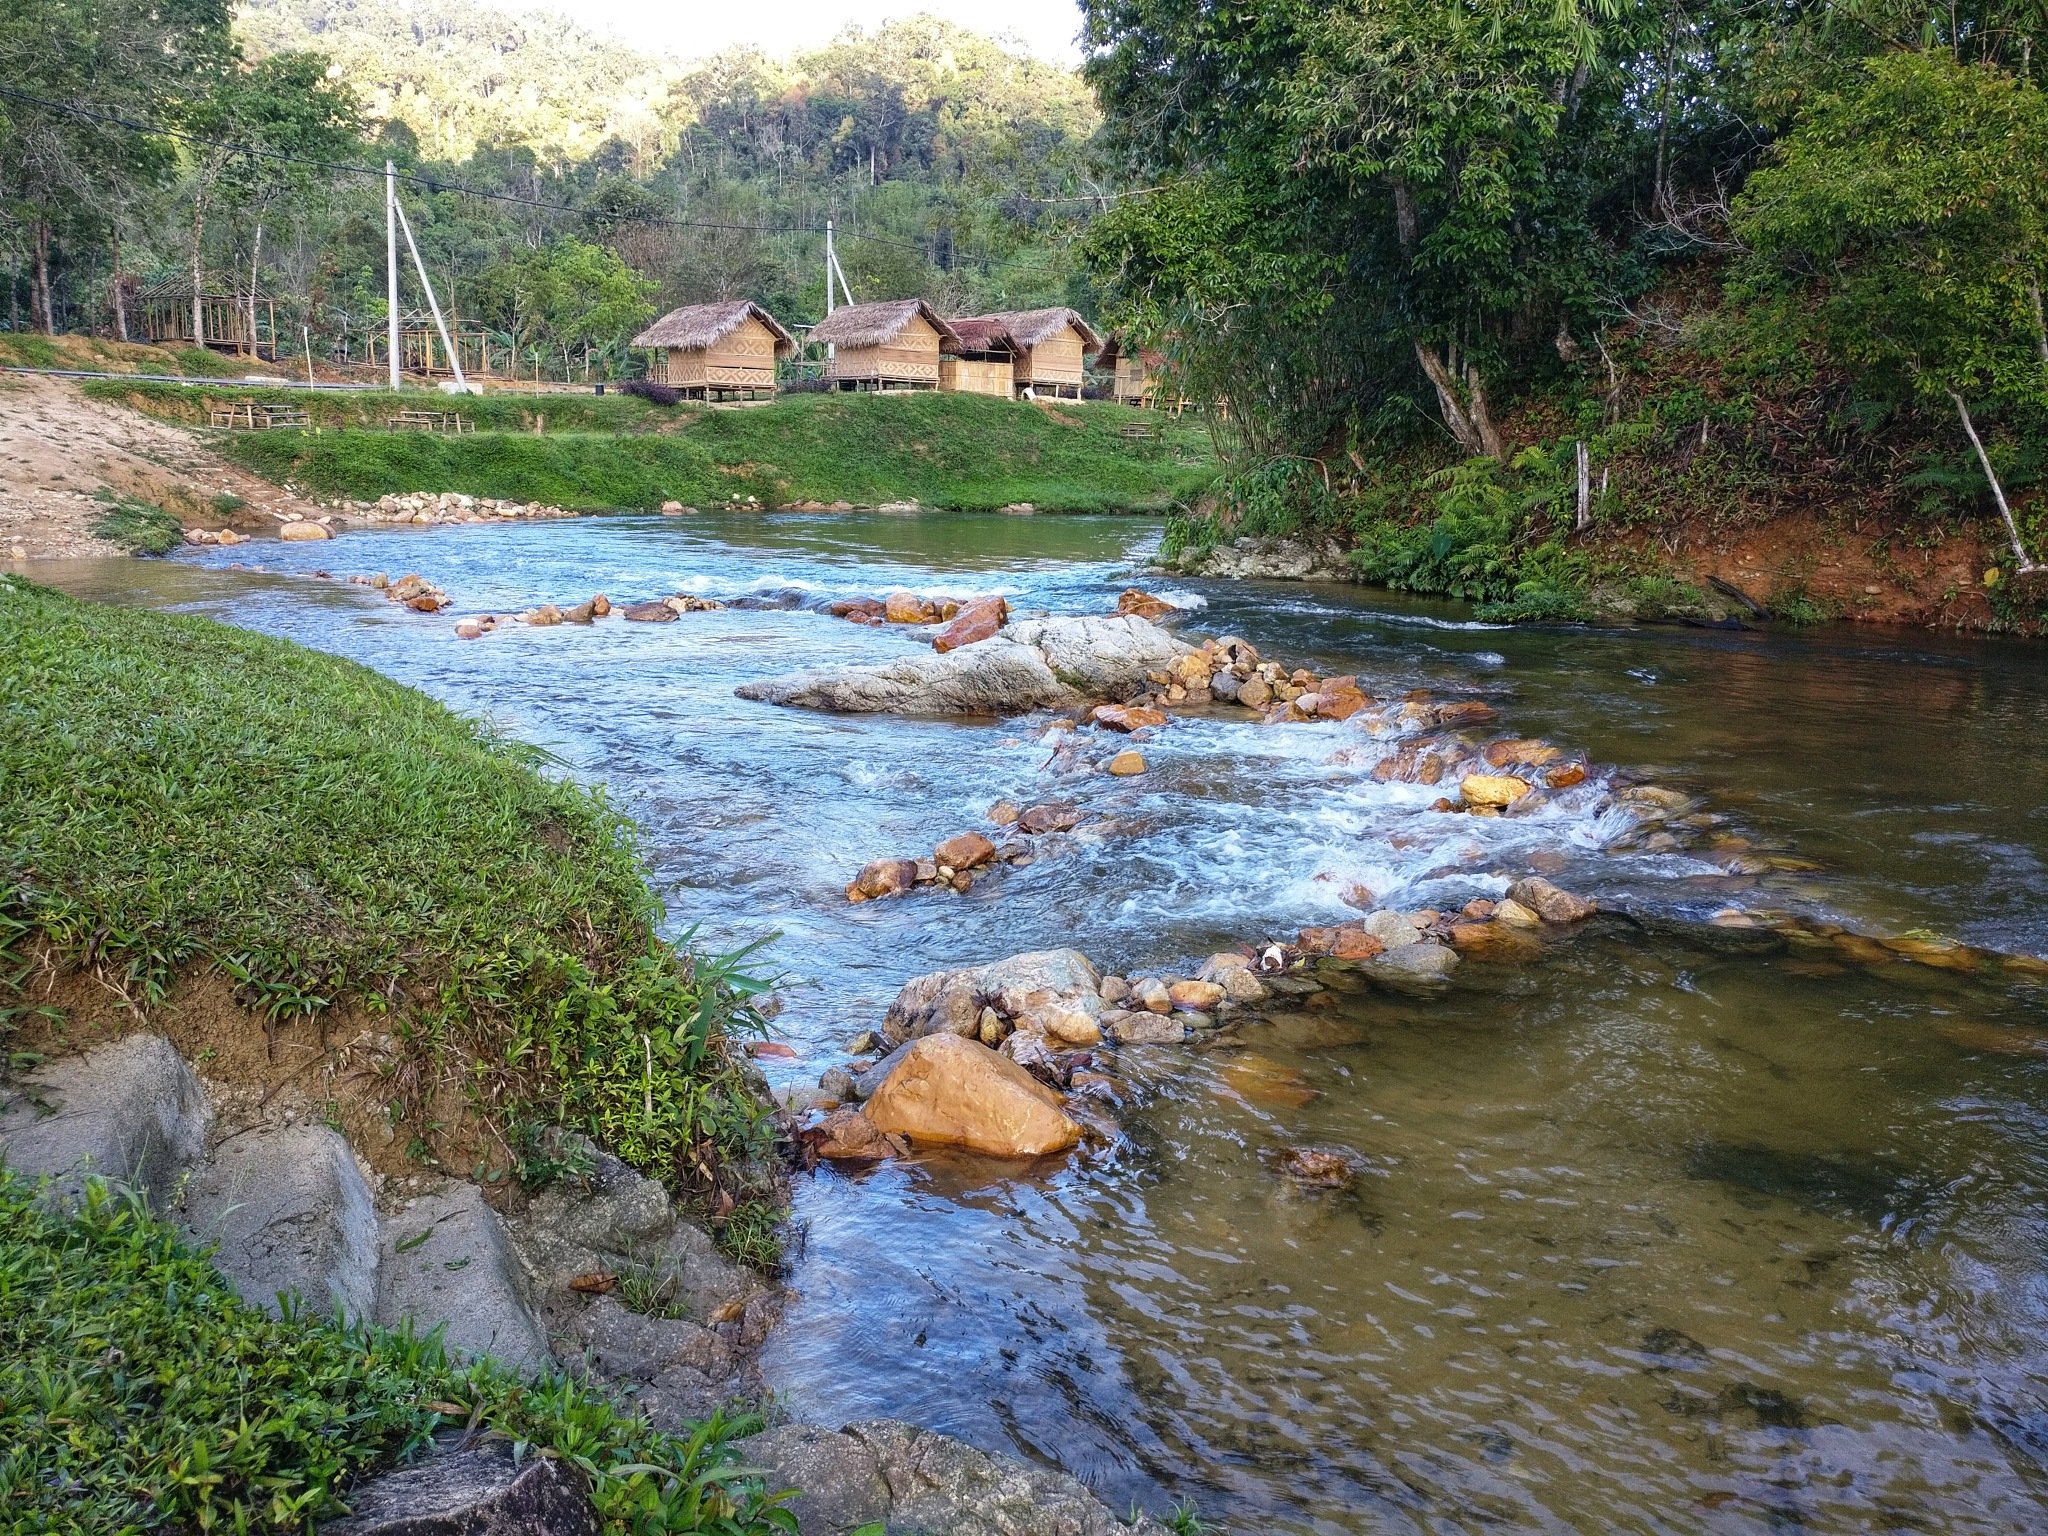 Mu River by jainmahmud